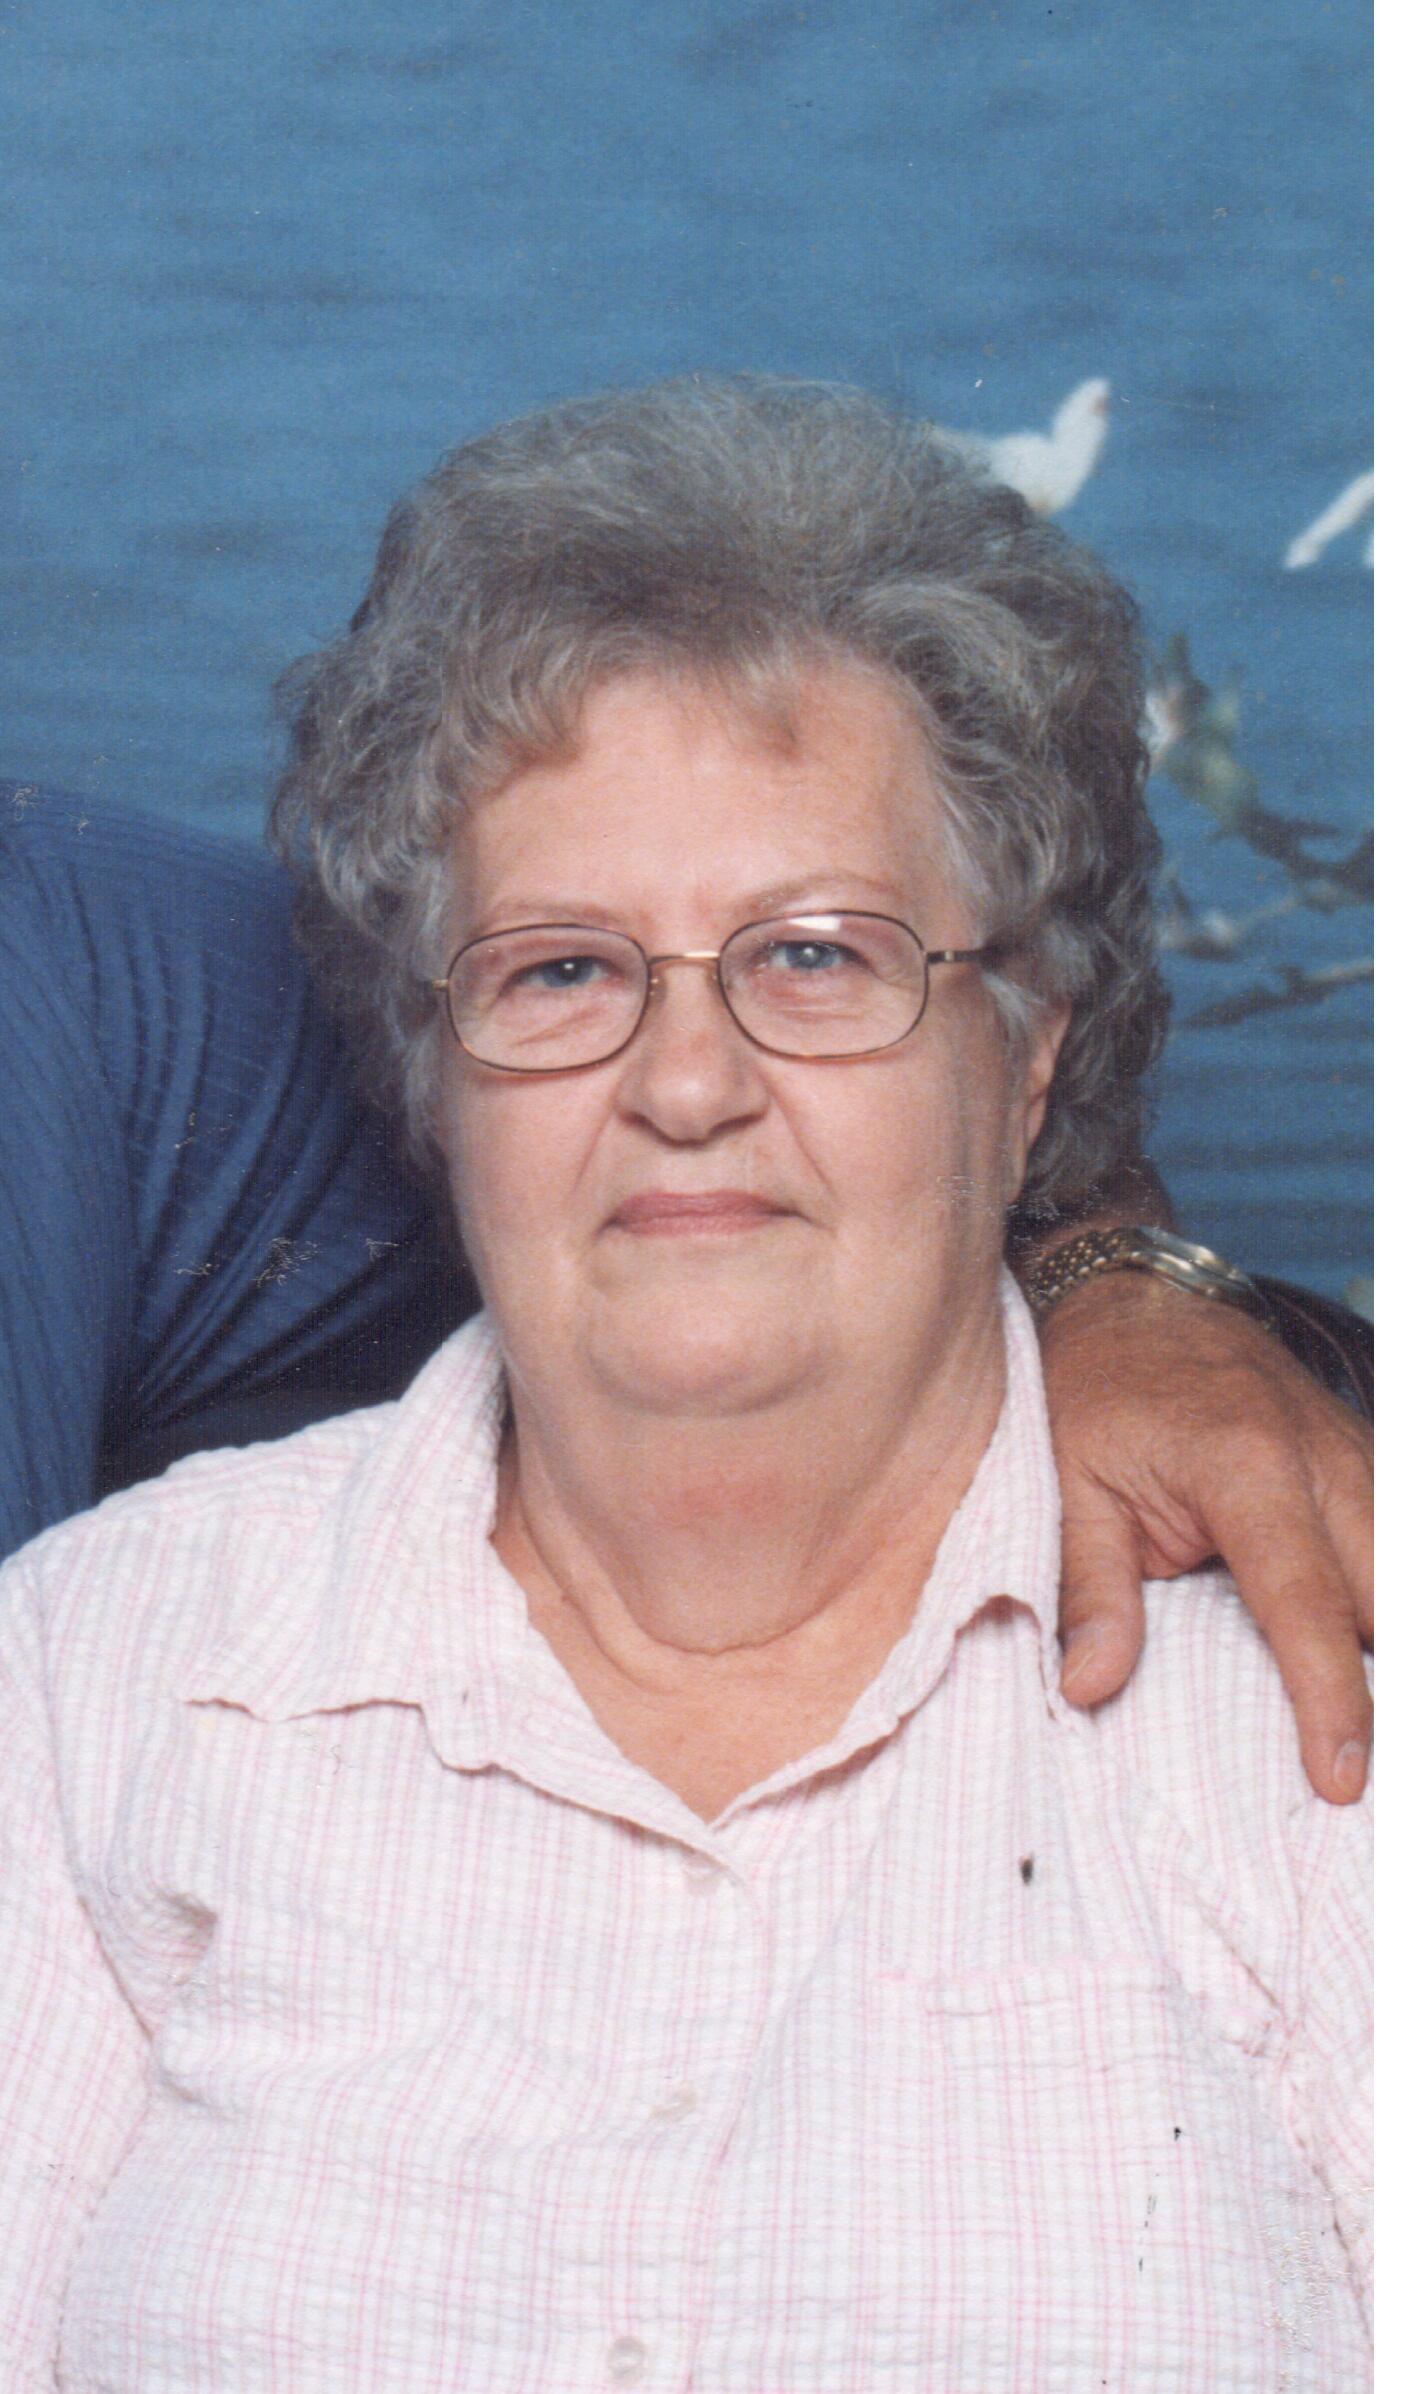 Cressie June Salyers, 80